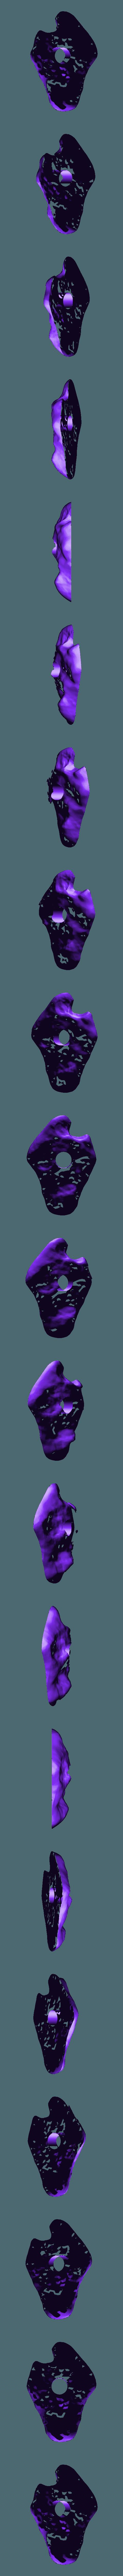 small2.stl Download free STL file The Space Set • 3D print design, HeribertoValle